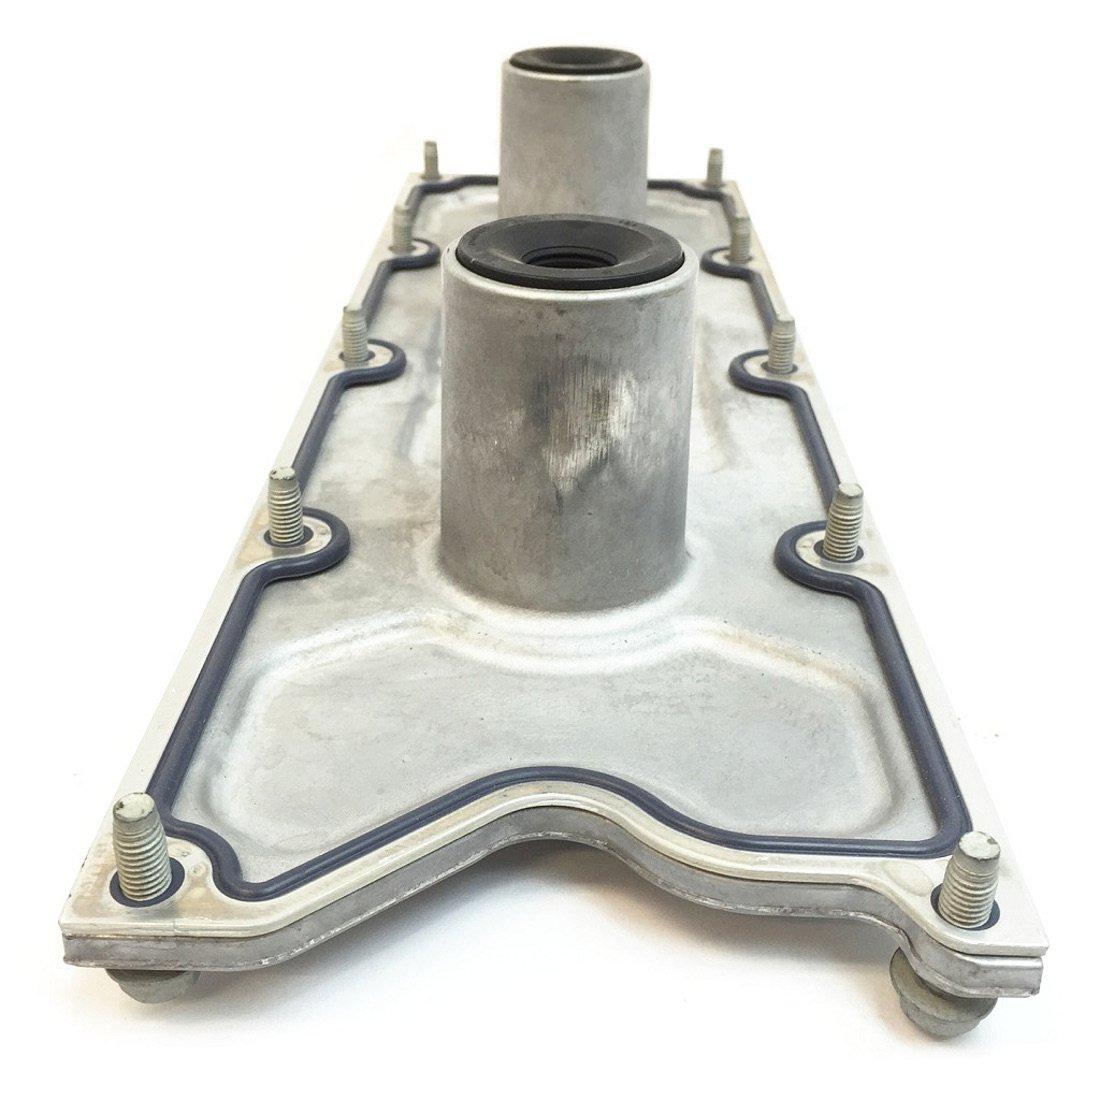 New Gm Oem Engine Valley Cover 12561107 Gen Iii Lm7 Lq4 5 7 Diagram Lq9 48l 53l 60l Automotive